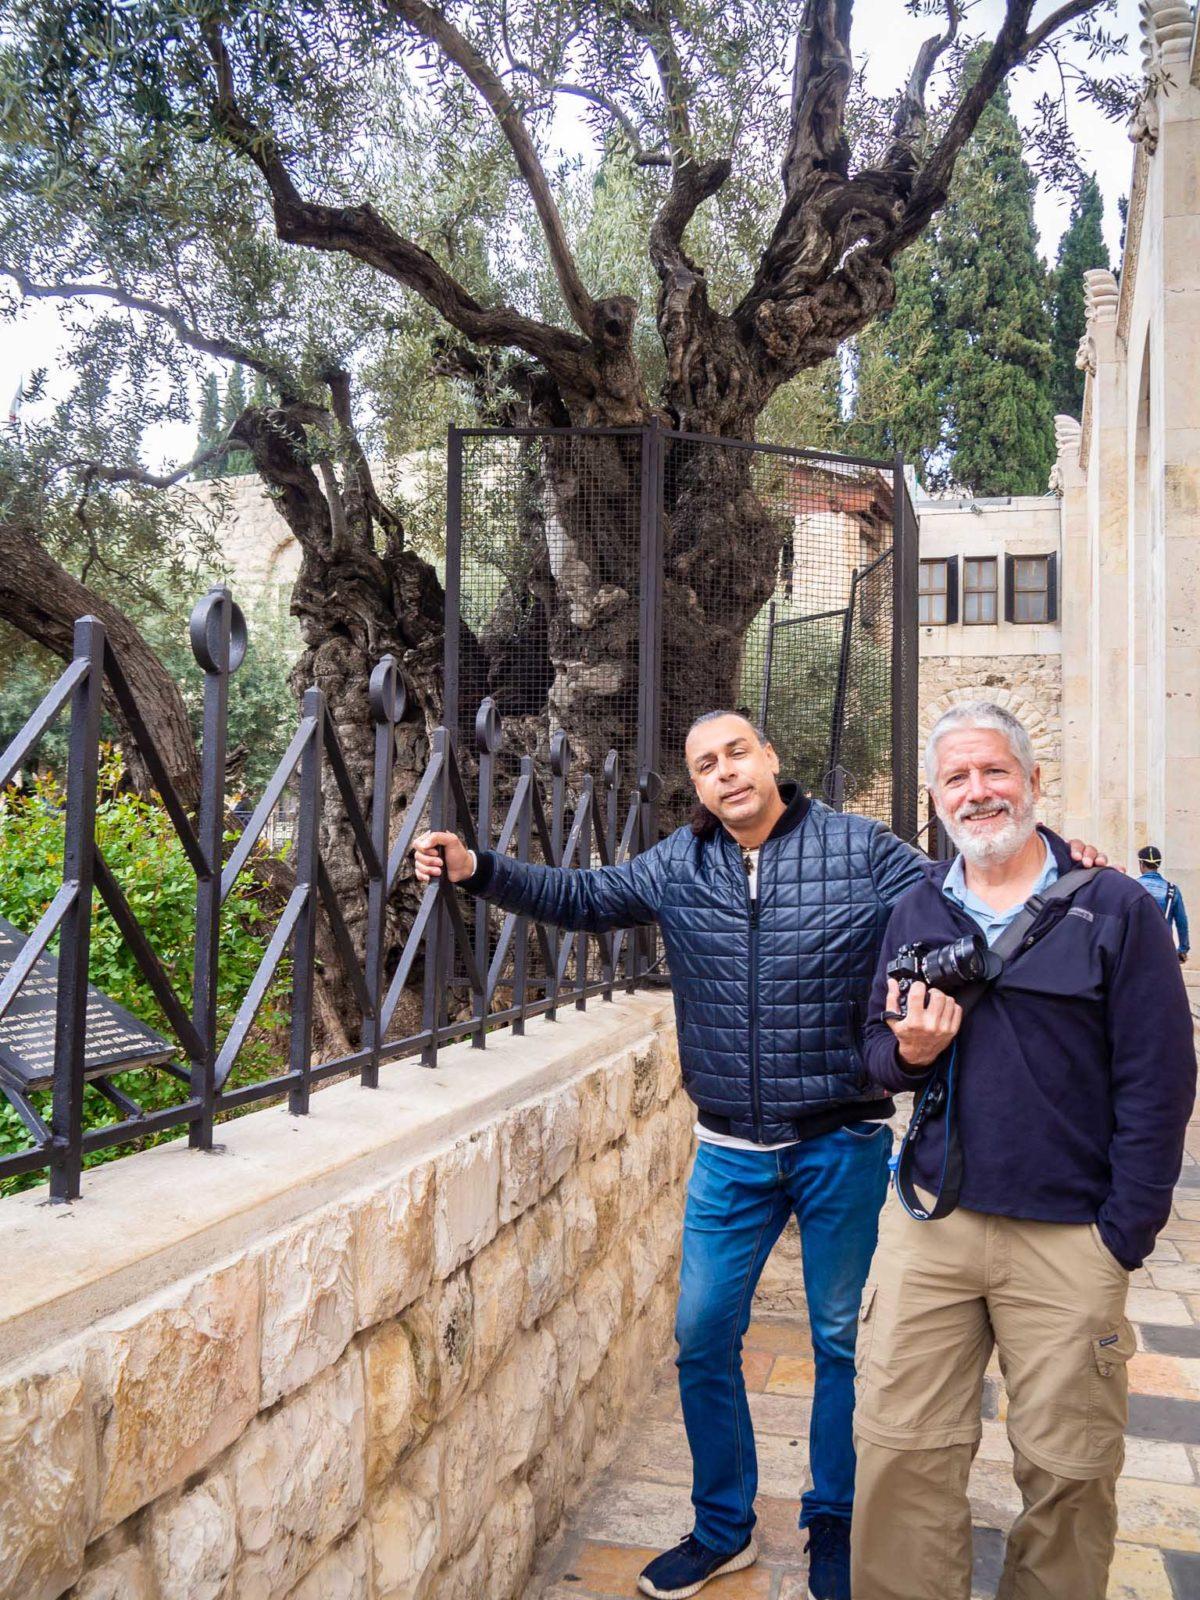 Olive tree in Gethsemane Garden